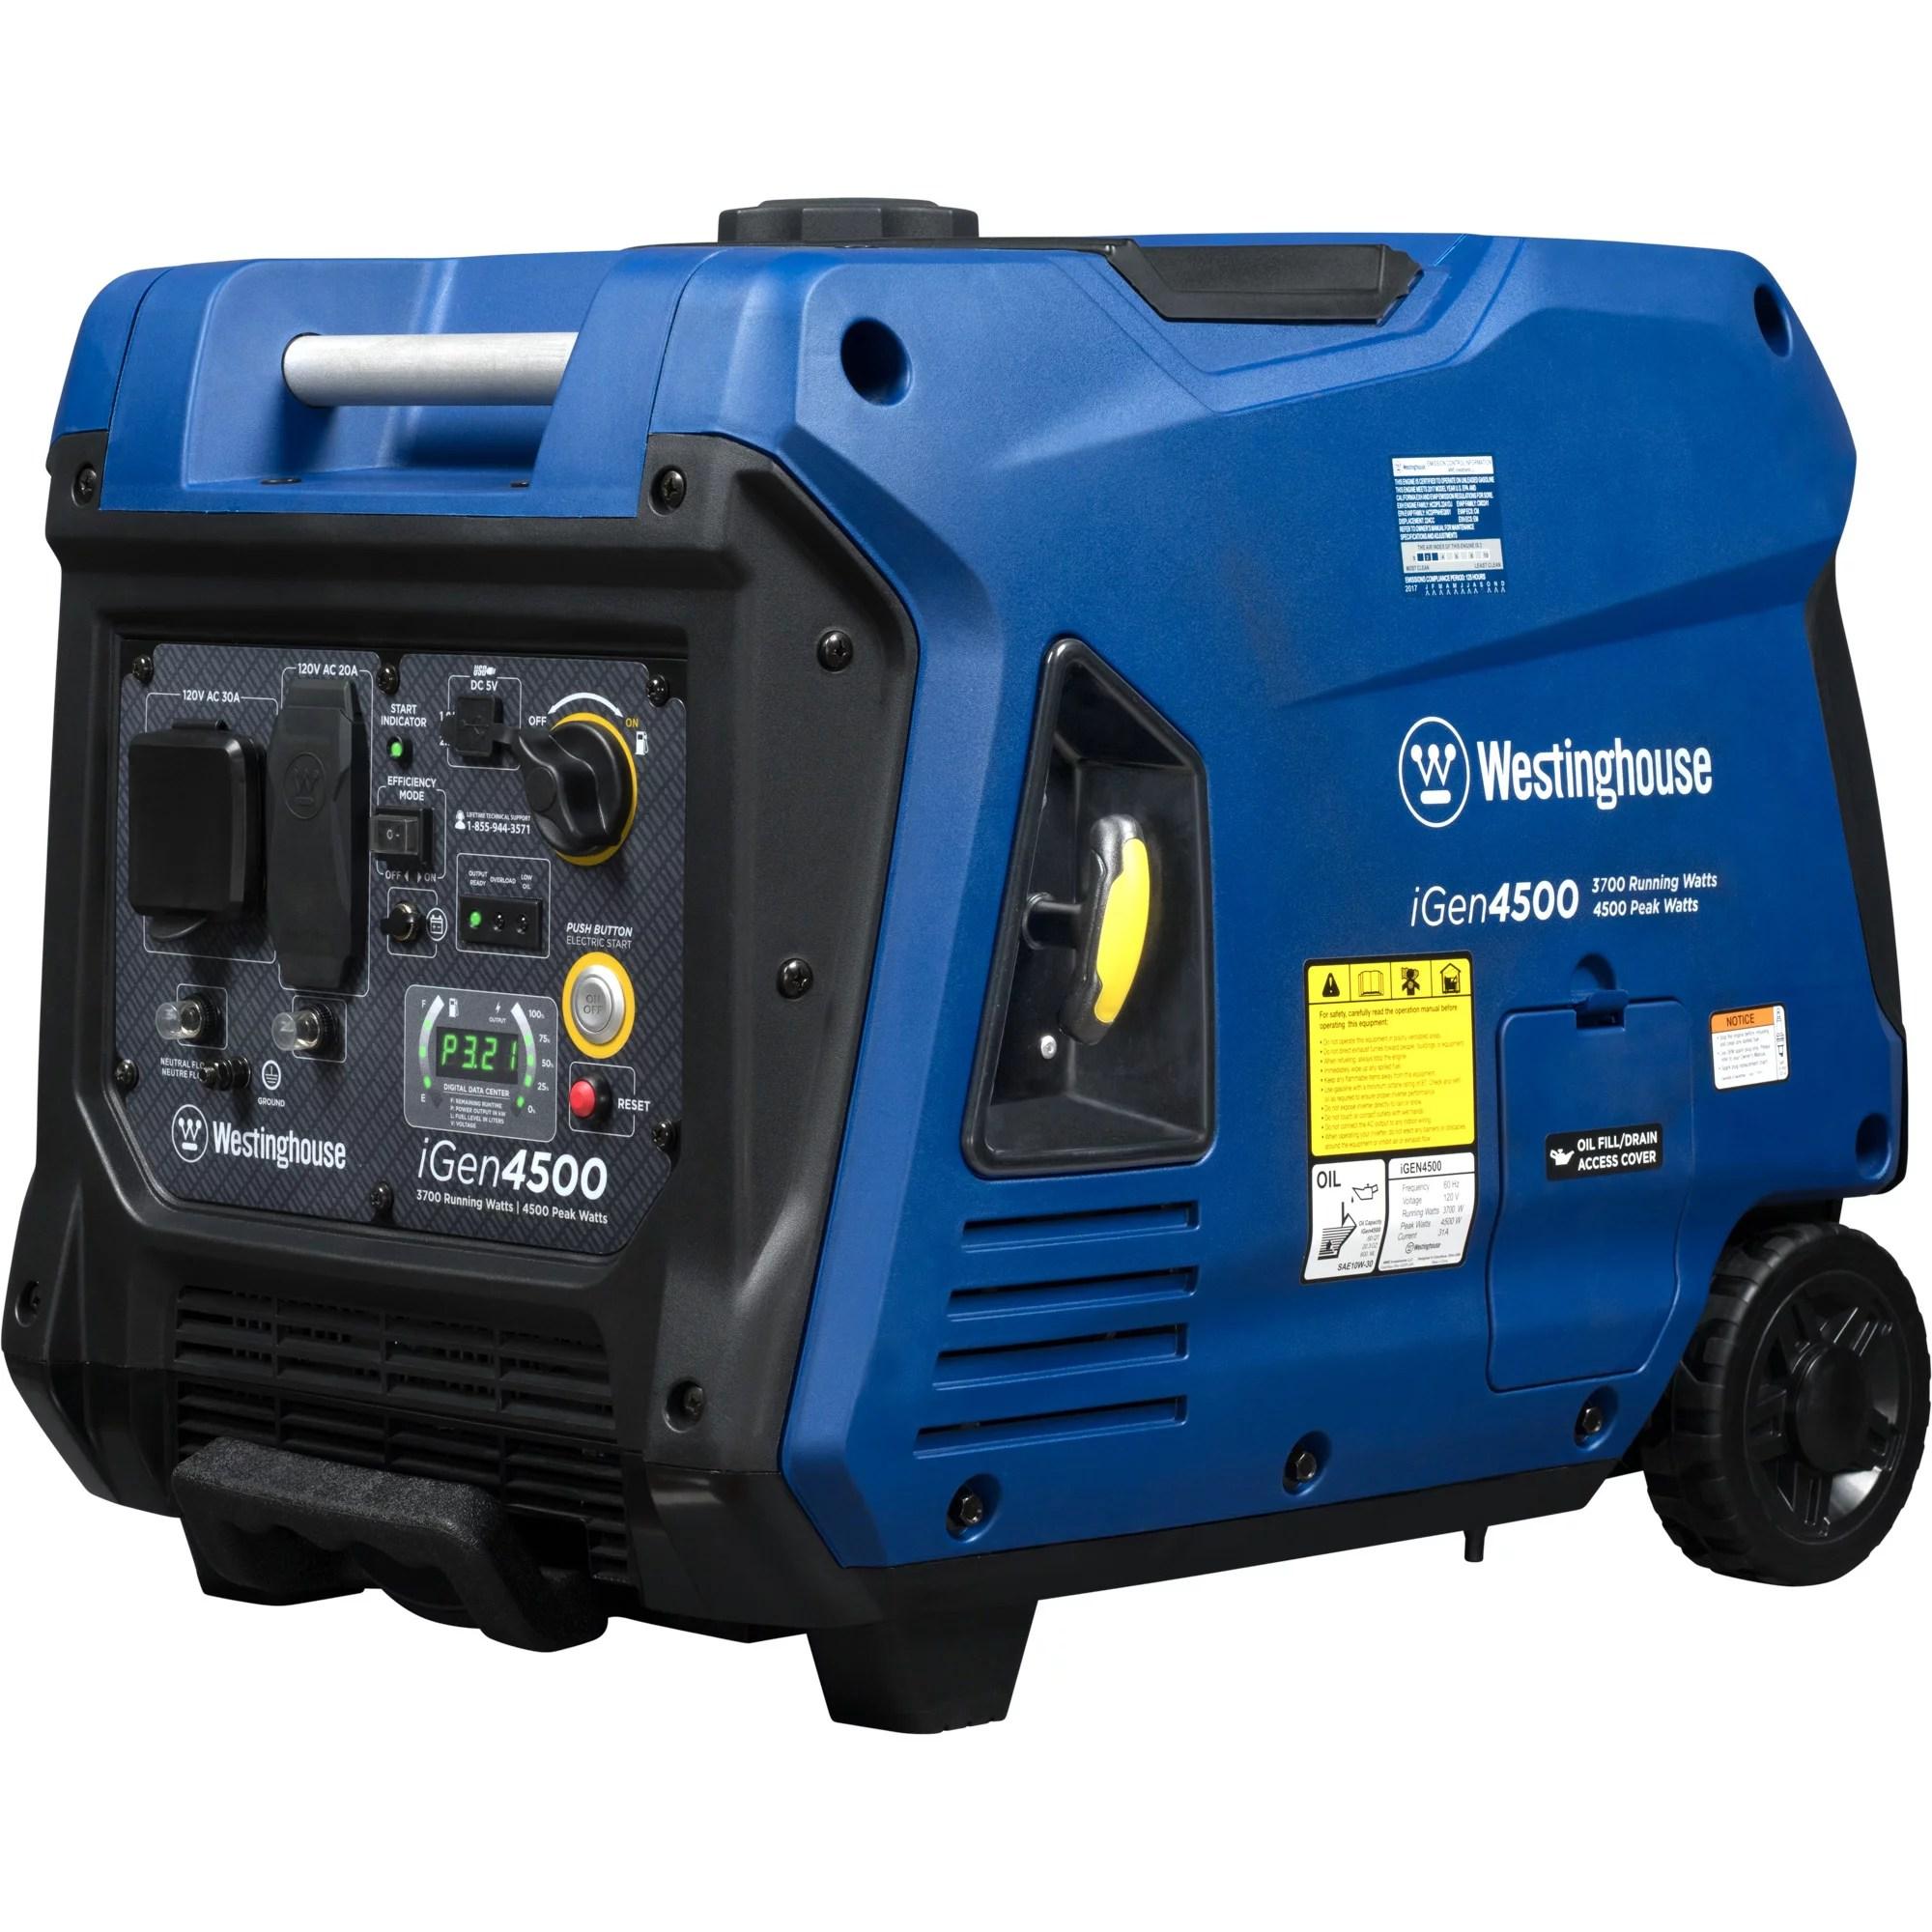 hight resolution of westinghouse igen4500 gas powered portable inverter generator walmart com